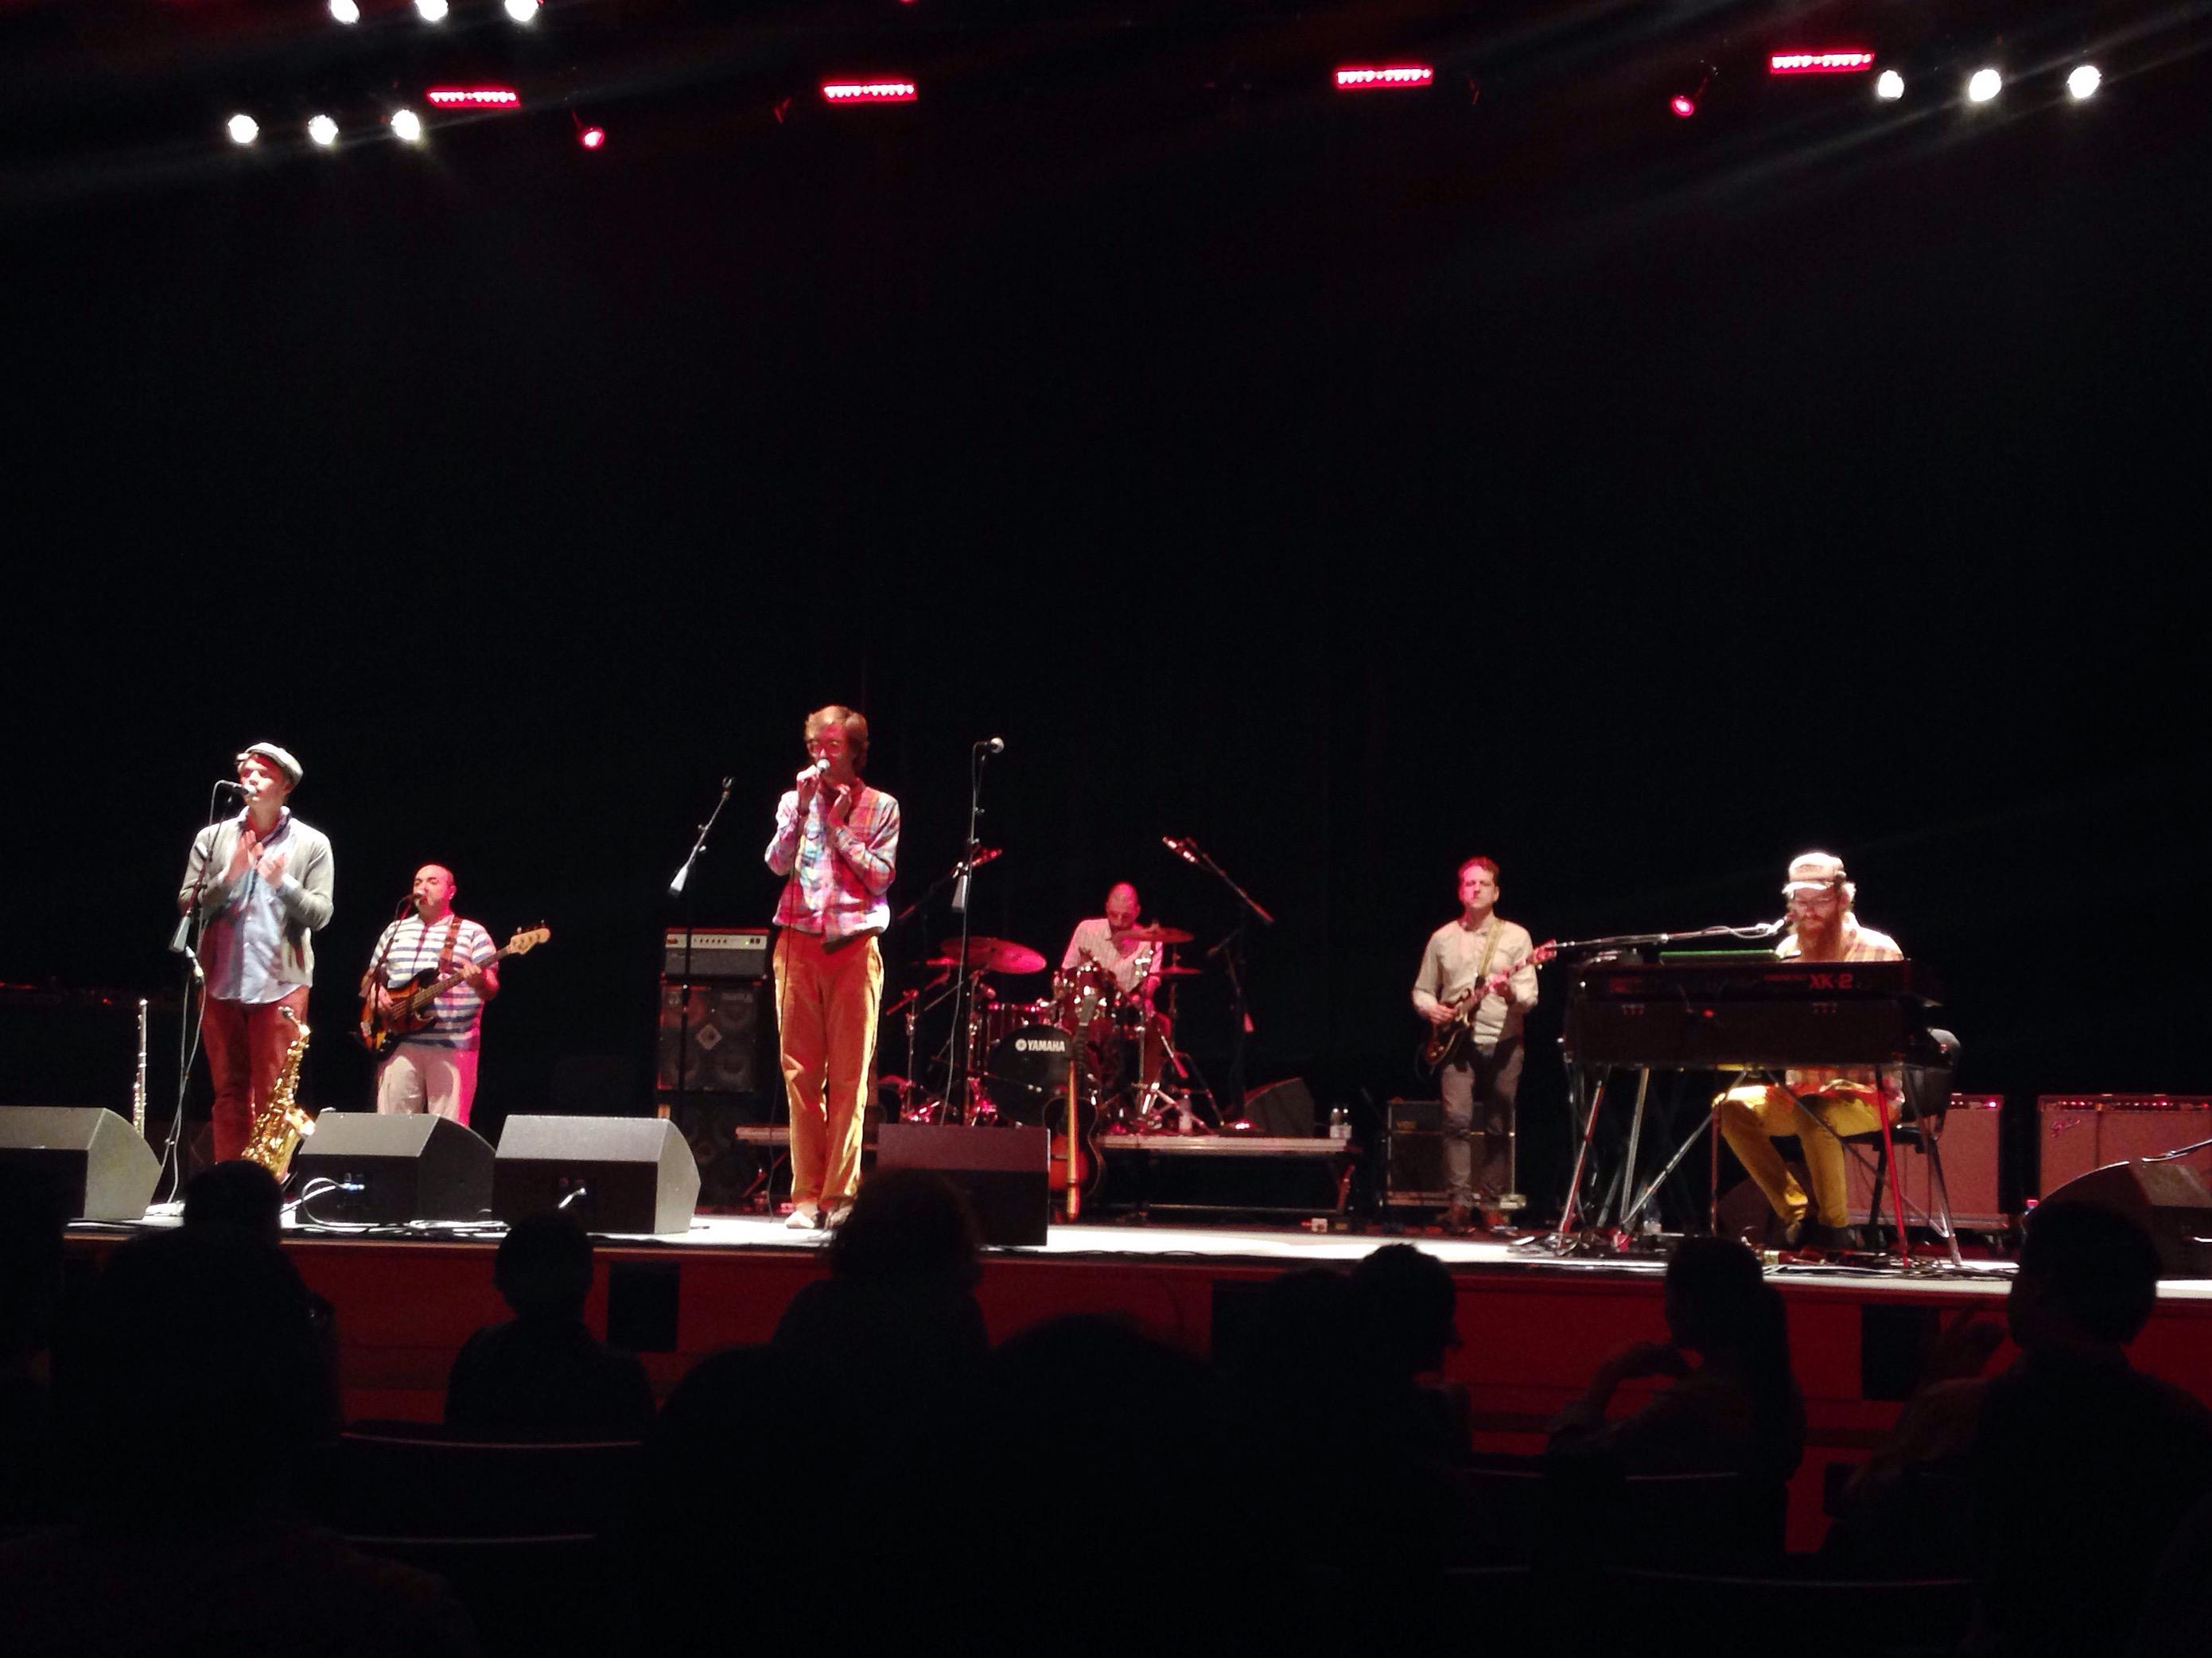 Erlend Øye & The Rainbows — 20.11.2014, Santiago - Chile